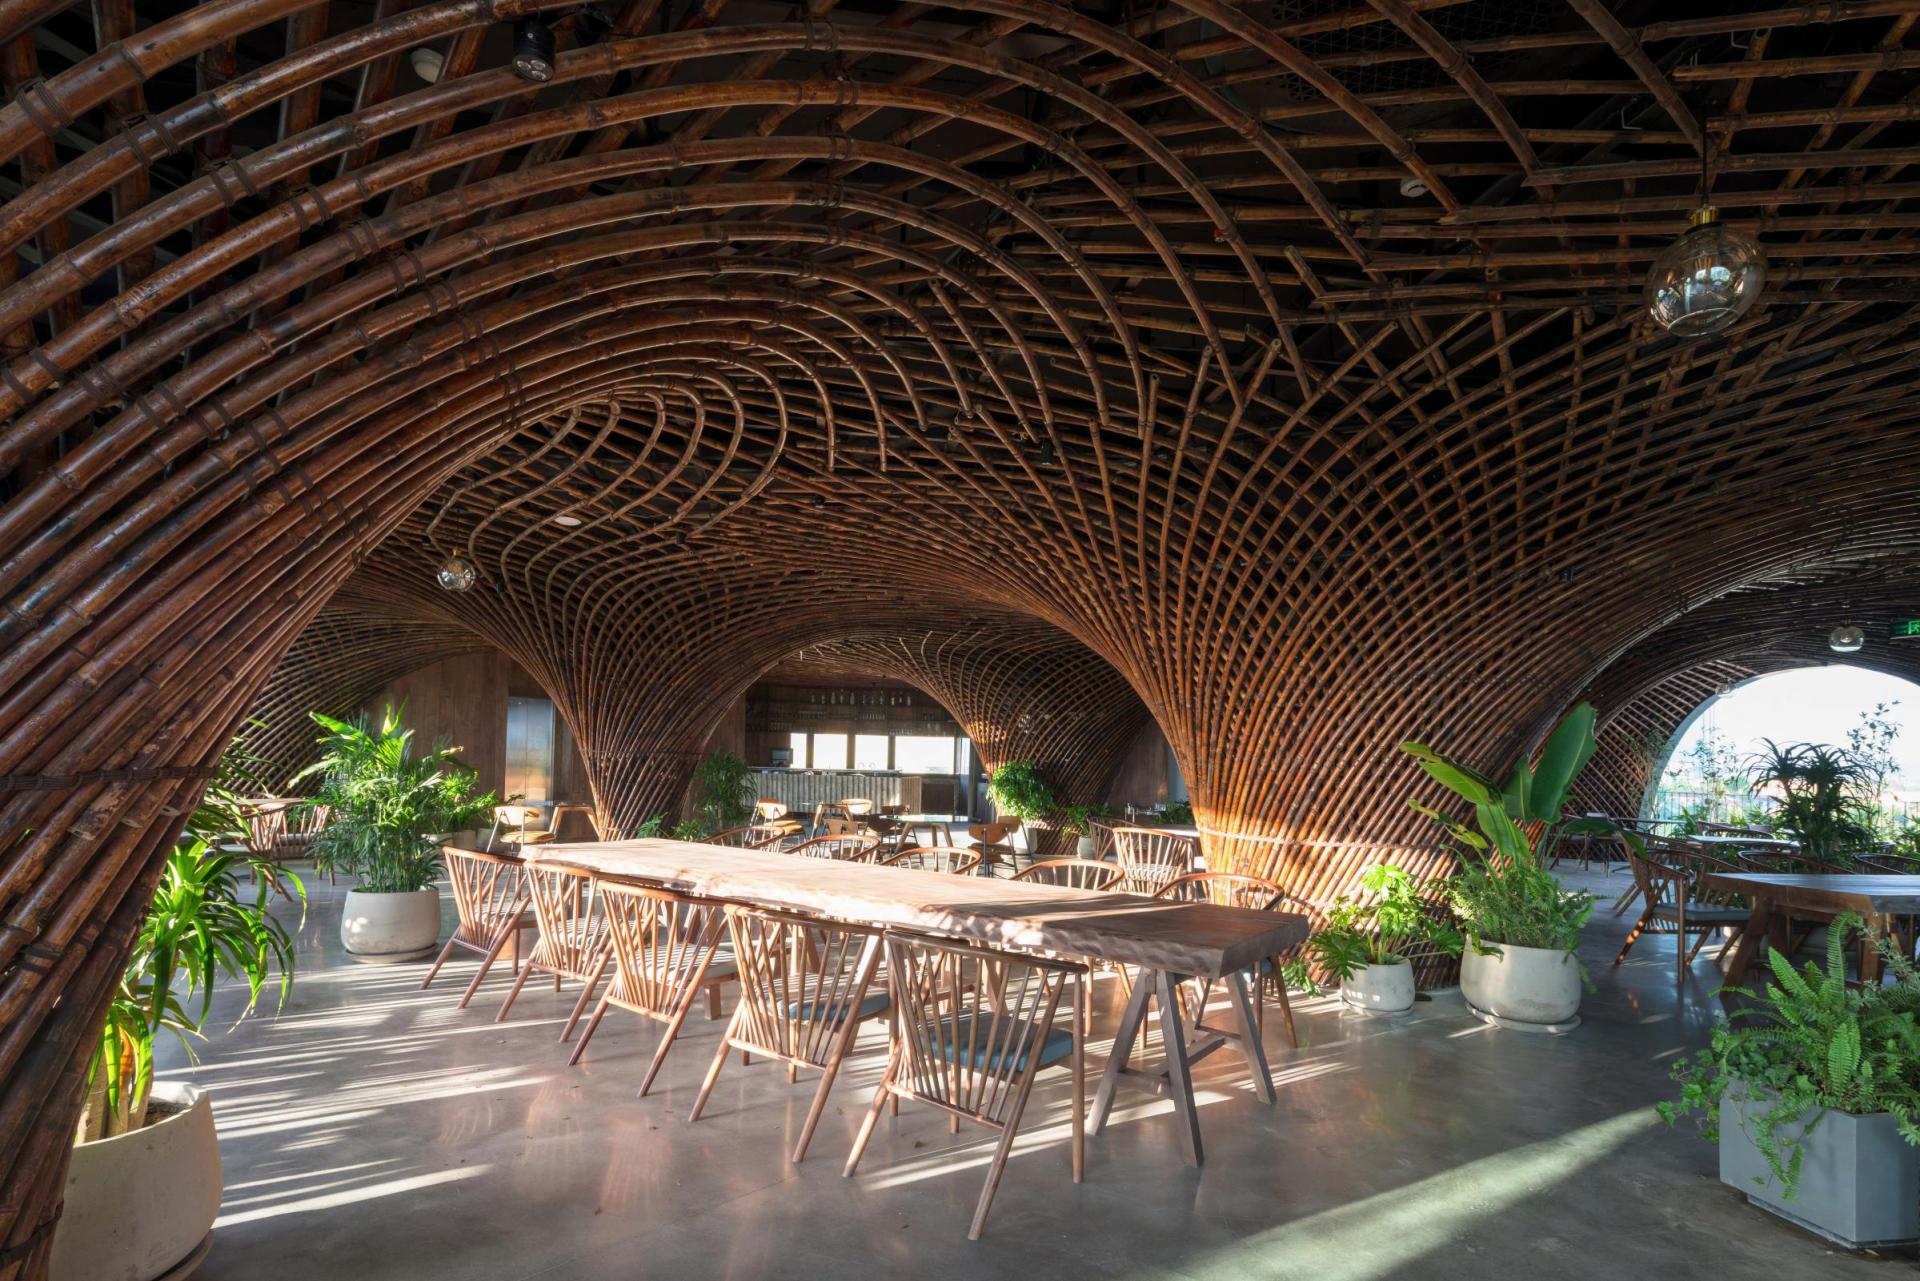 Coffee shop in Vietnam wins int'l architecture award